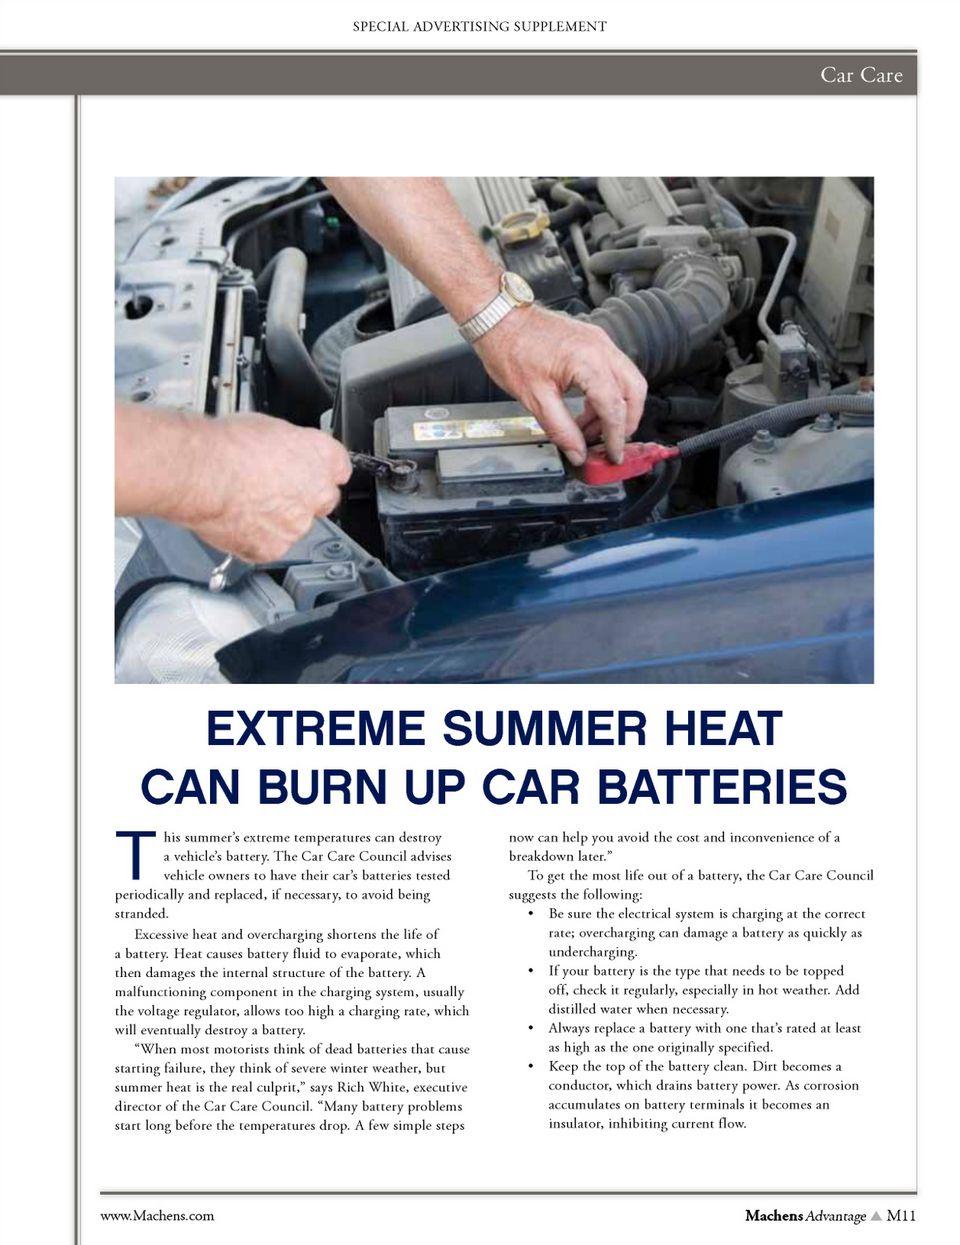 Machens Advantage July 2013 Page 11 Car care, Summer